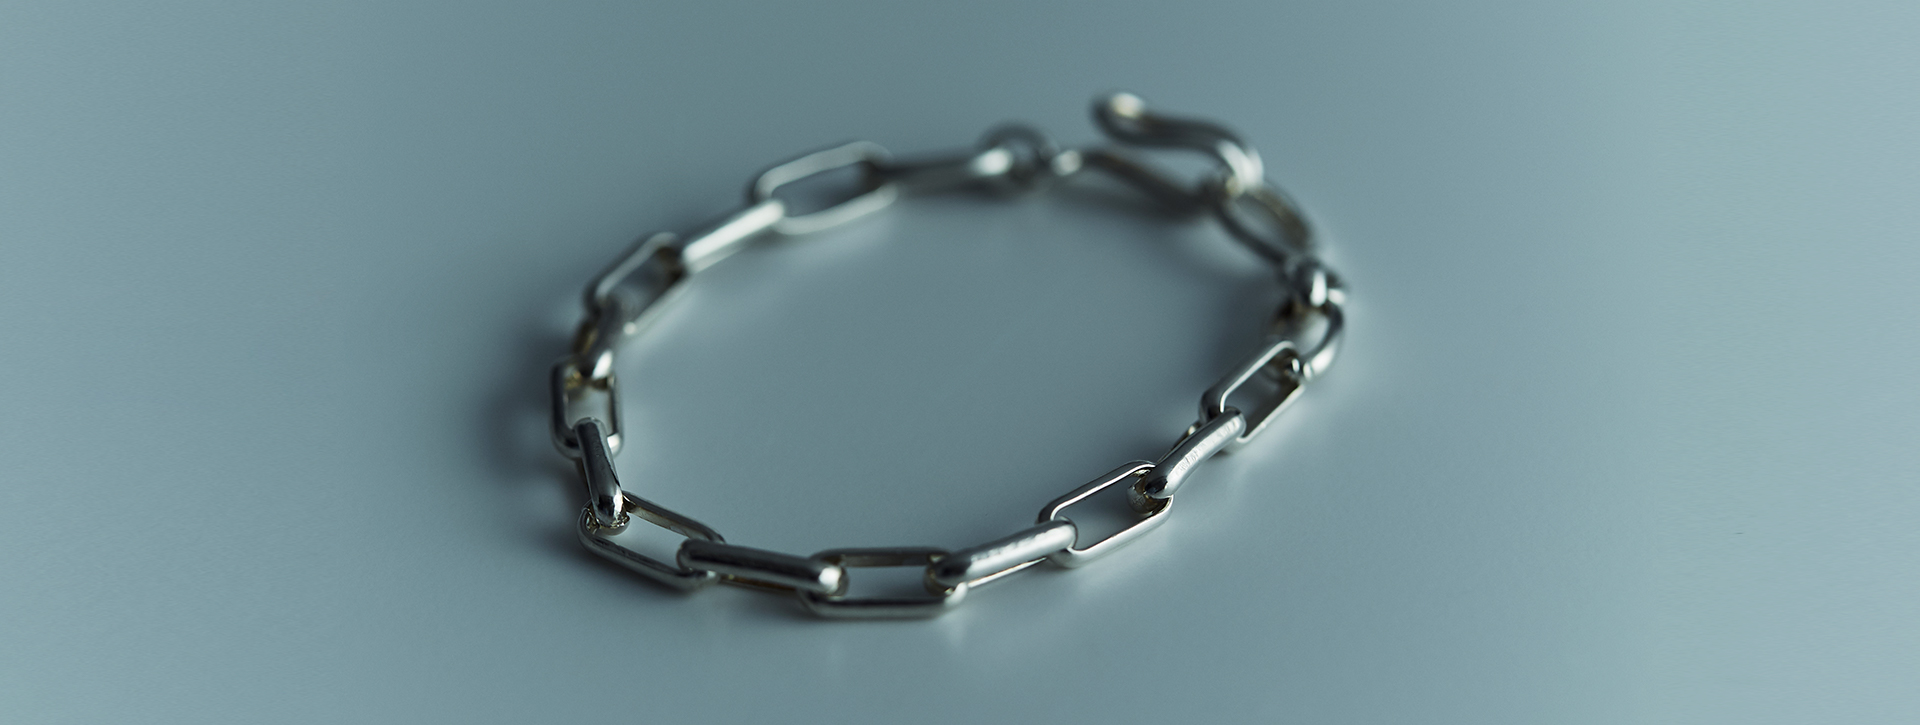 wire link chain bracelet